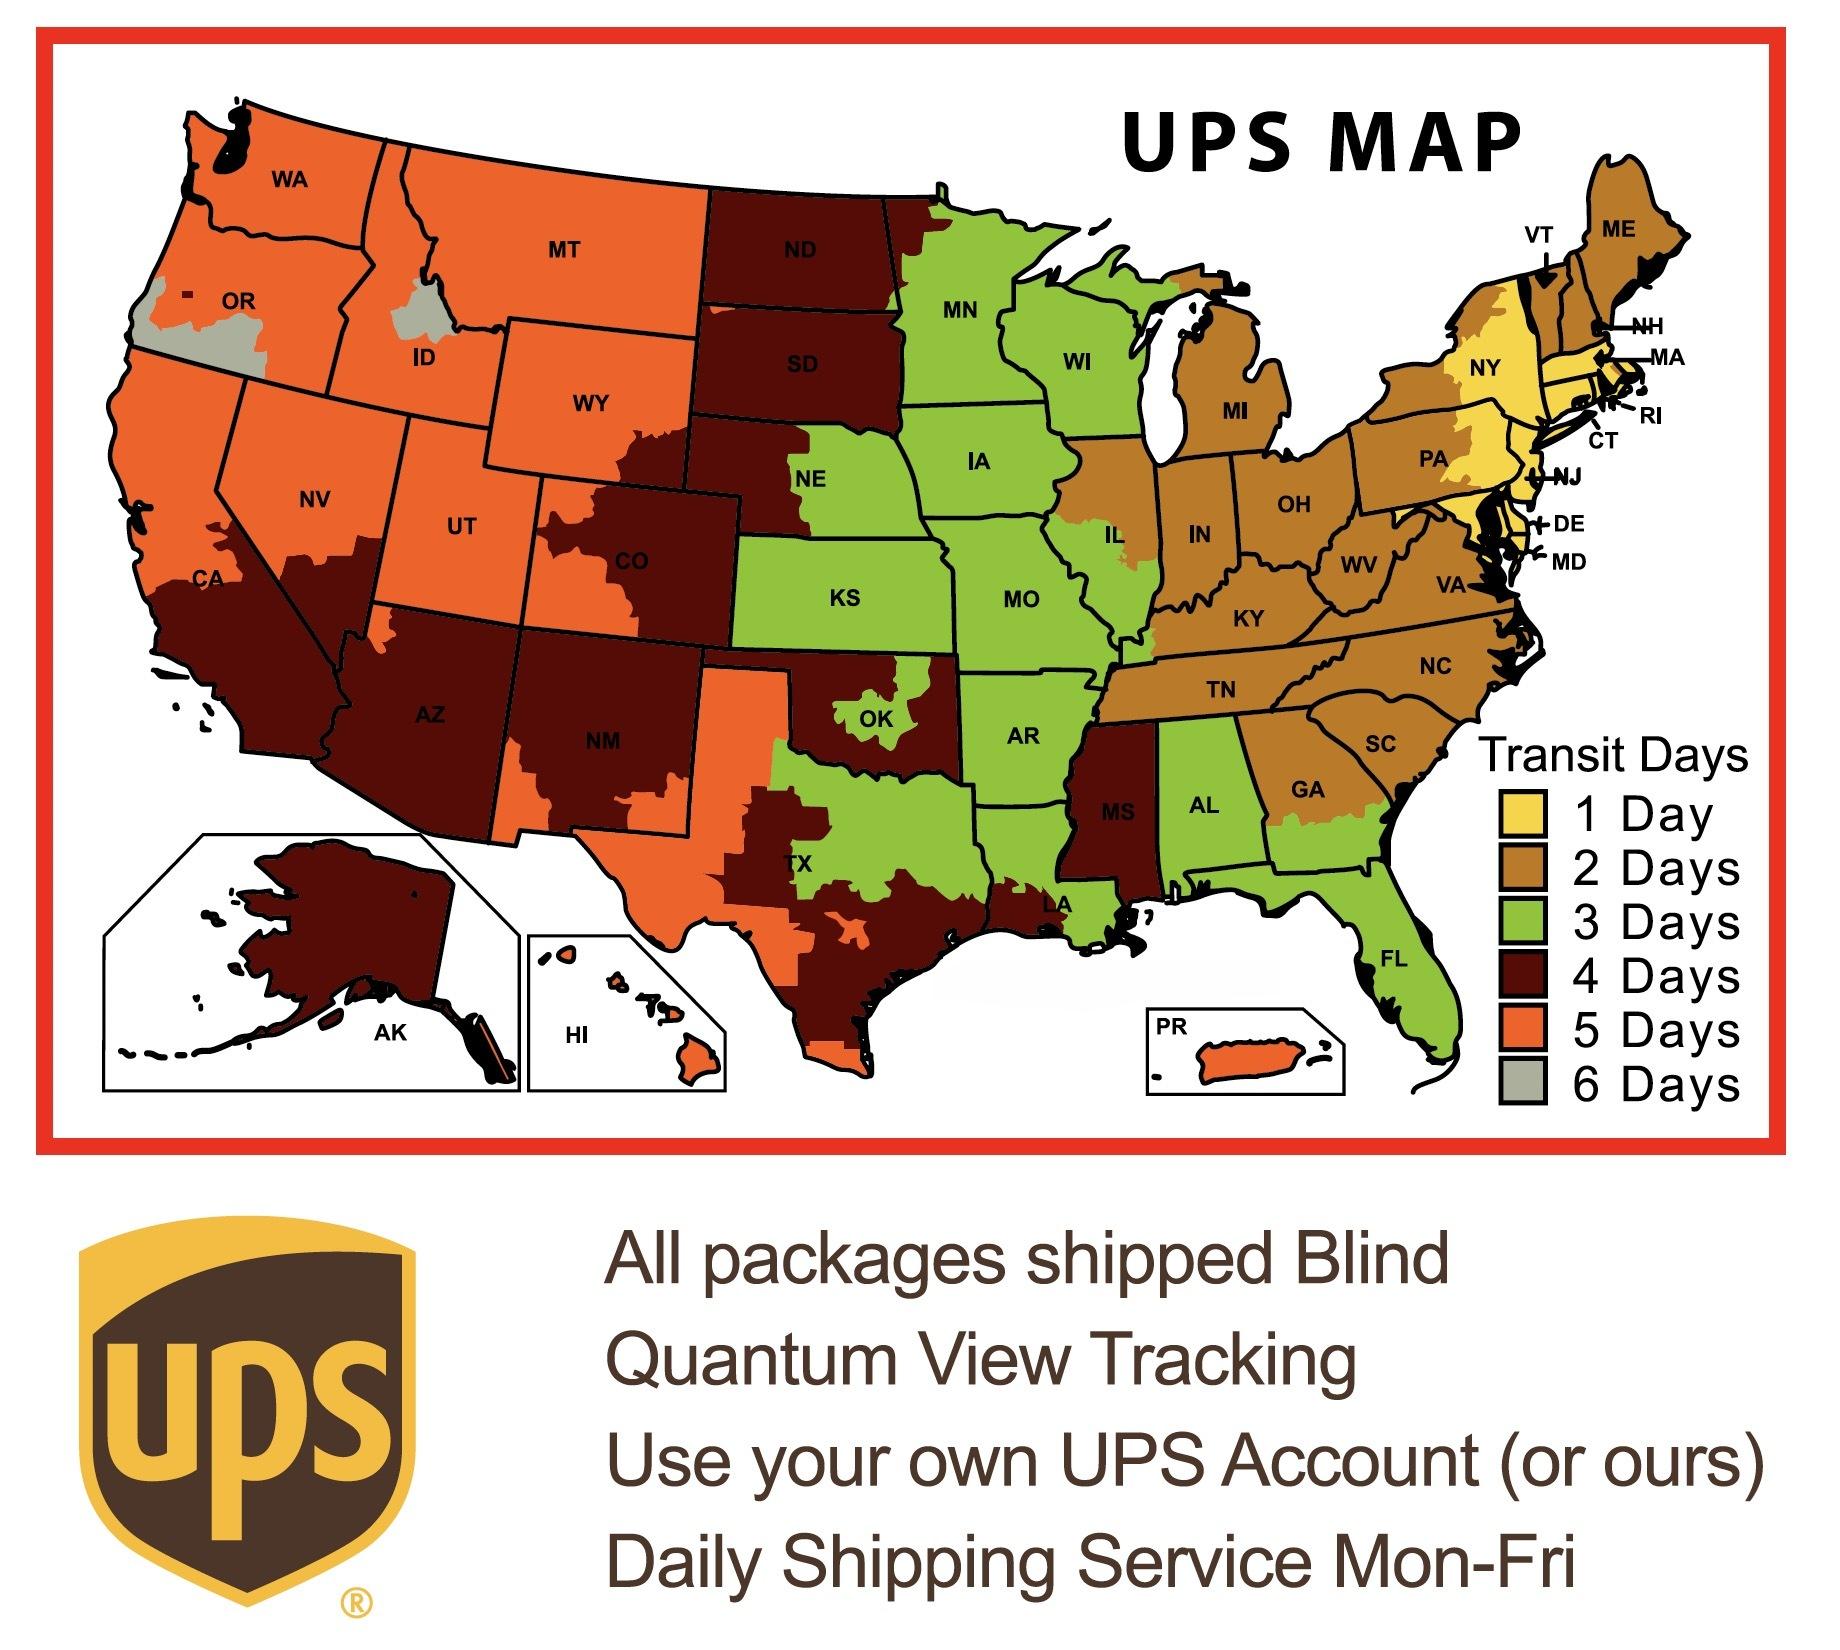 UPS Shipping Image